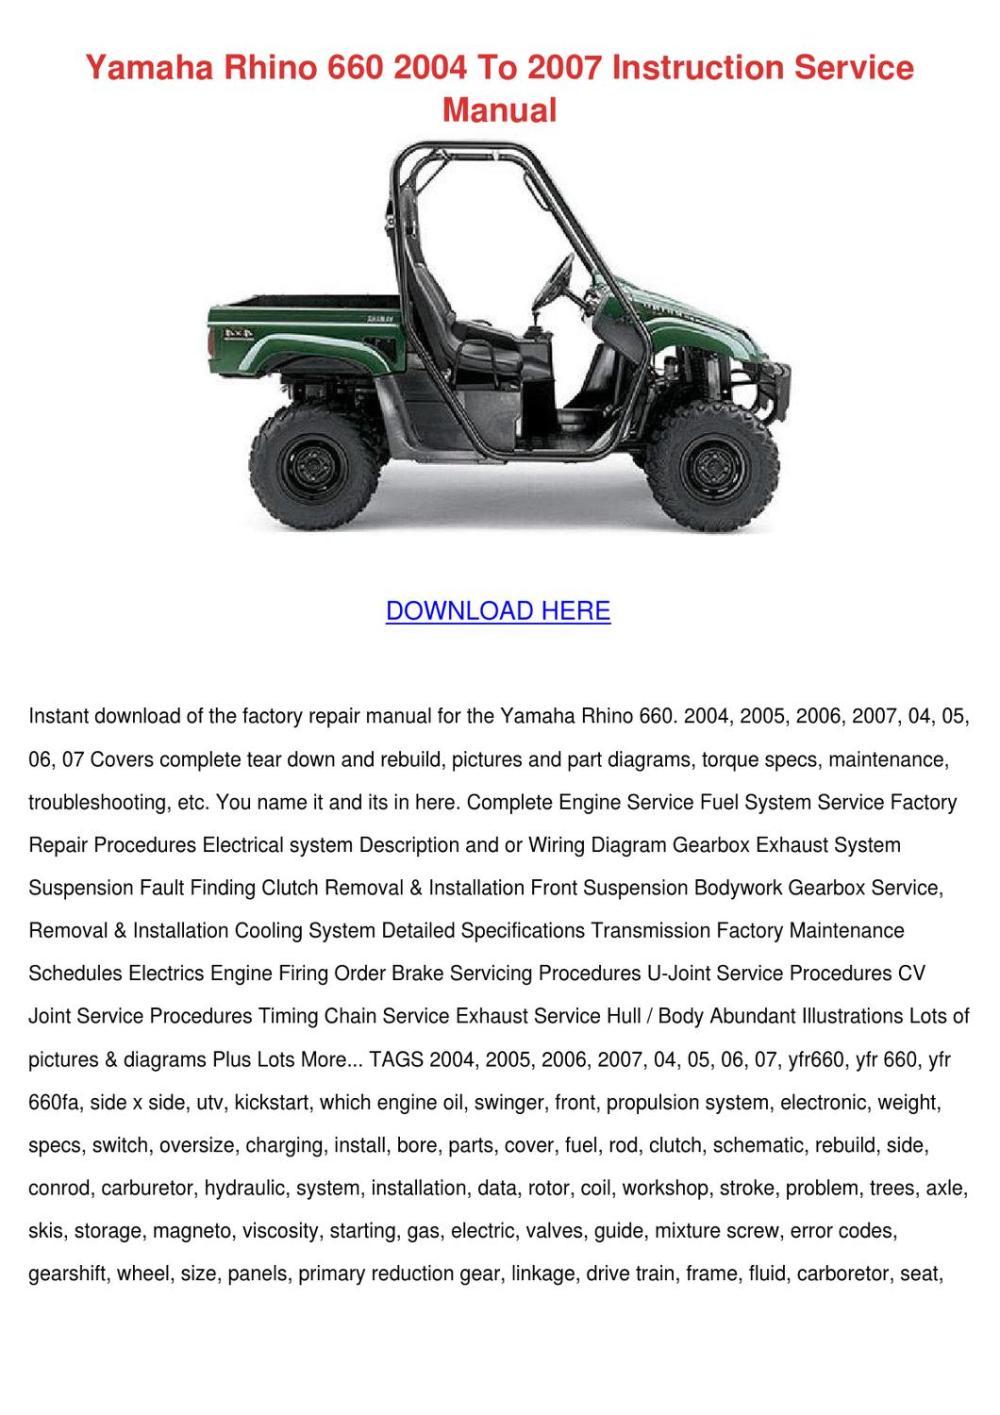 medium resolution of 05 raptor 660 transmission rebuild